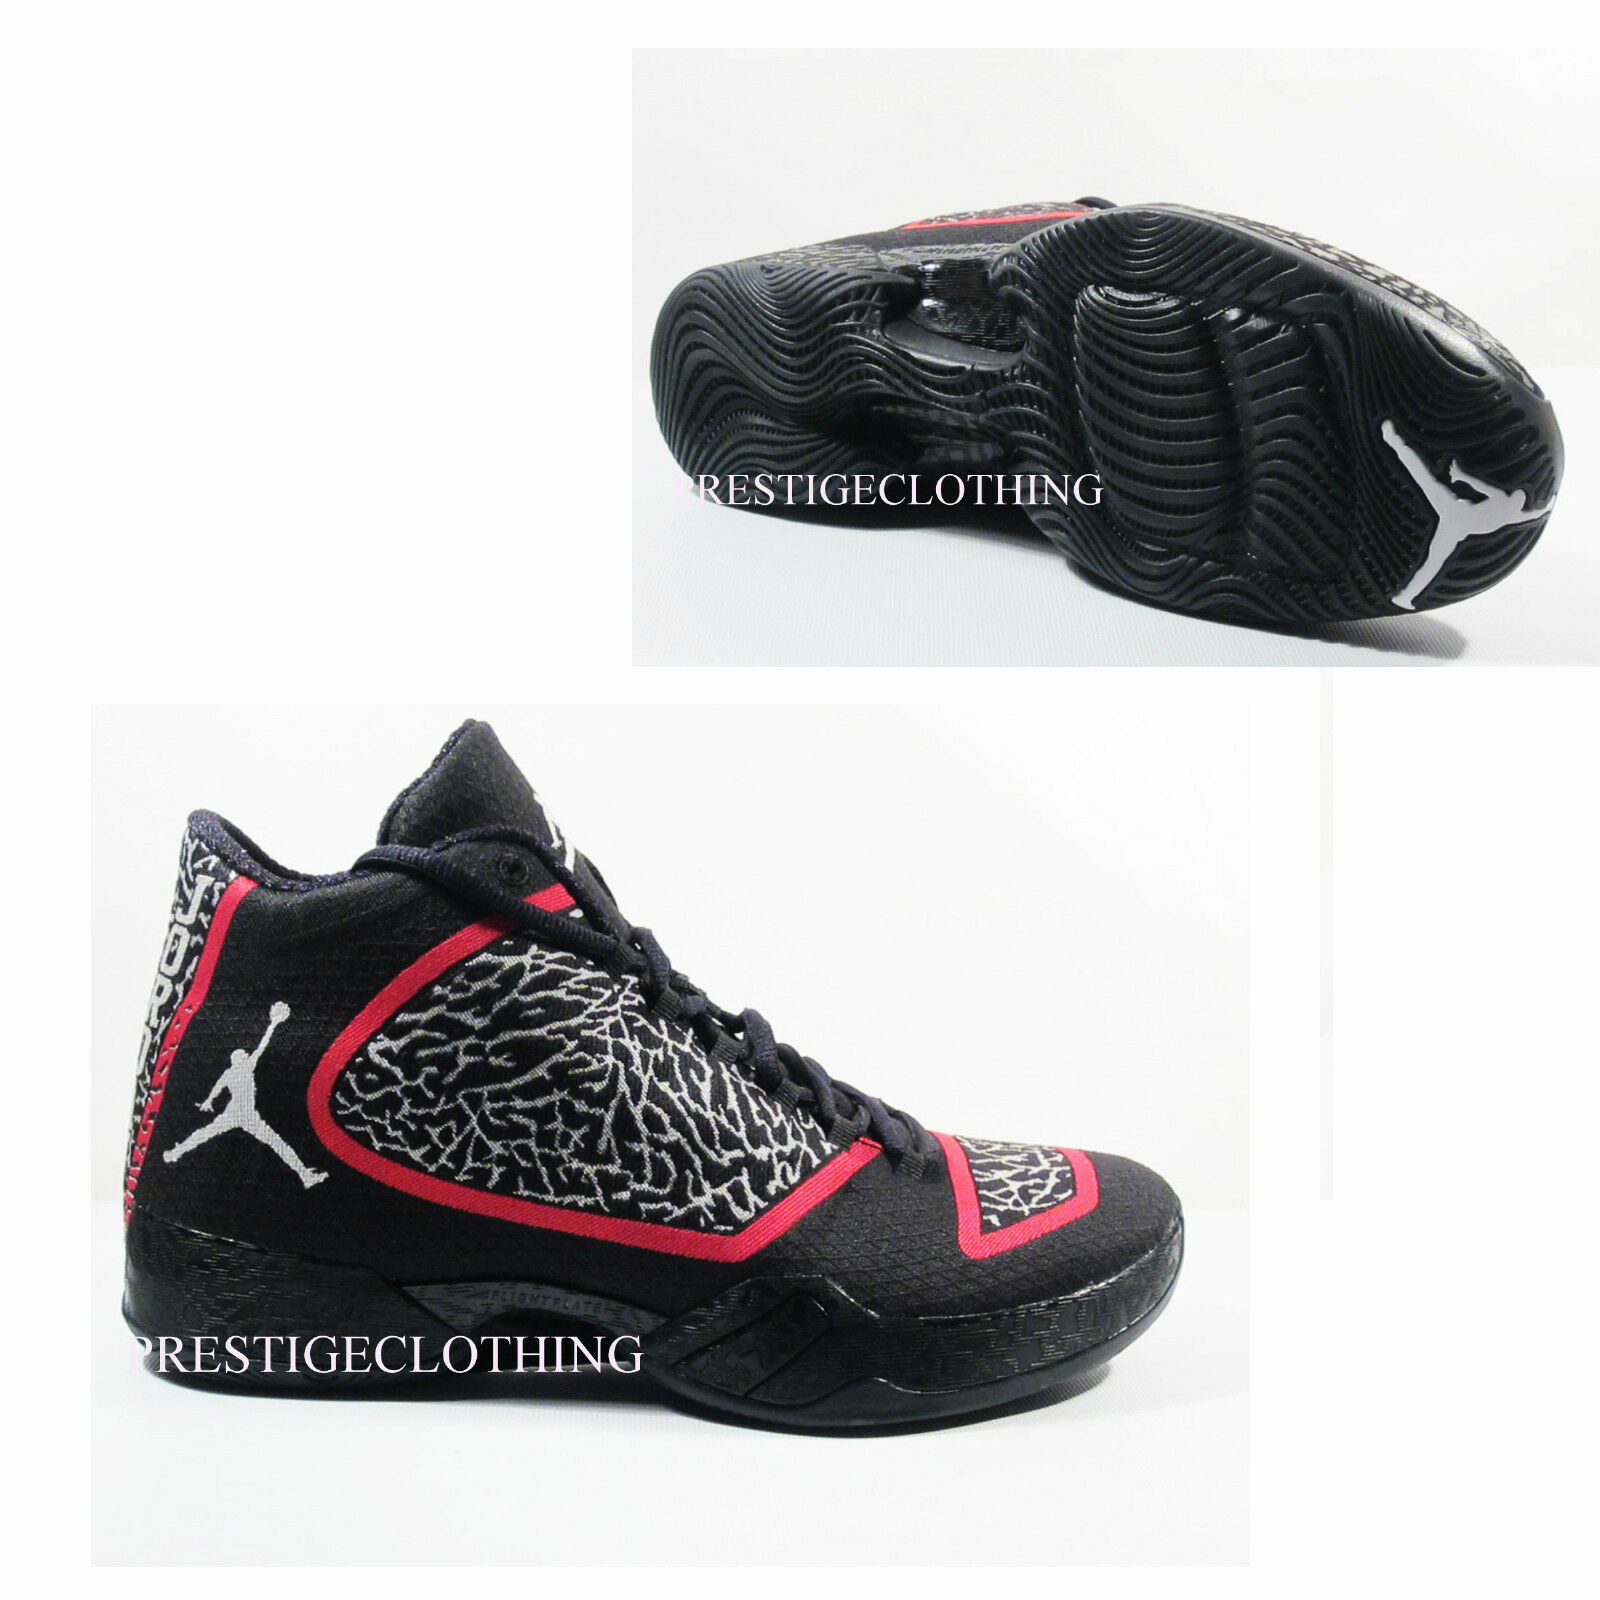 Original Nike Gym Air Jordan XX9 Negro Blanco Gym Nike Rojo Trainers 695515023 5bbaa0